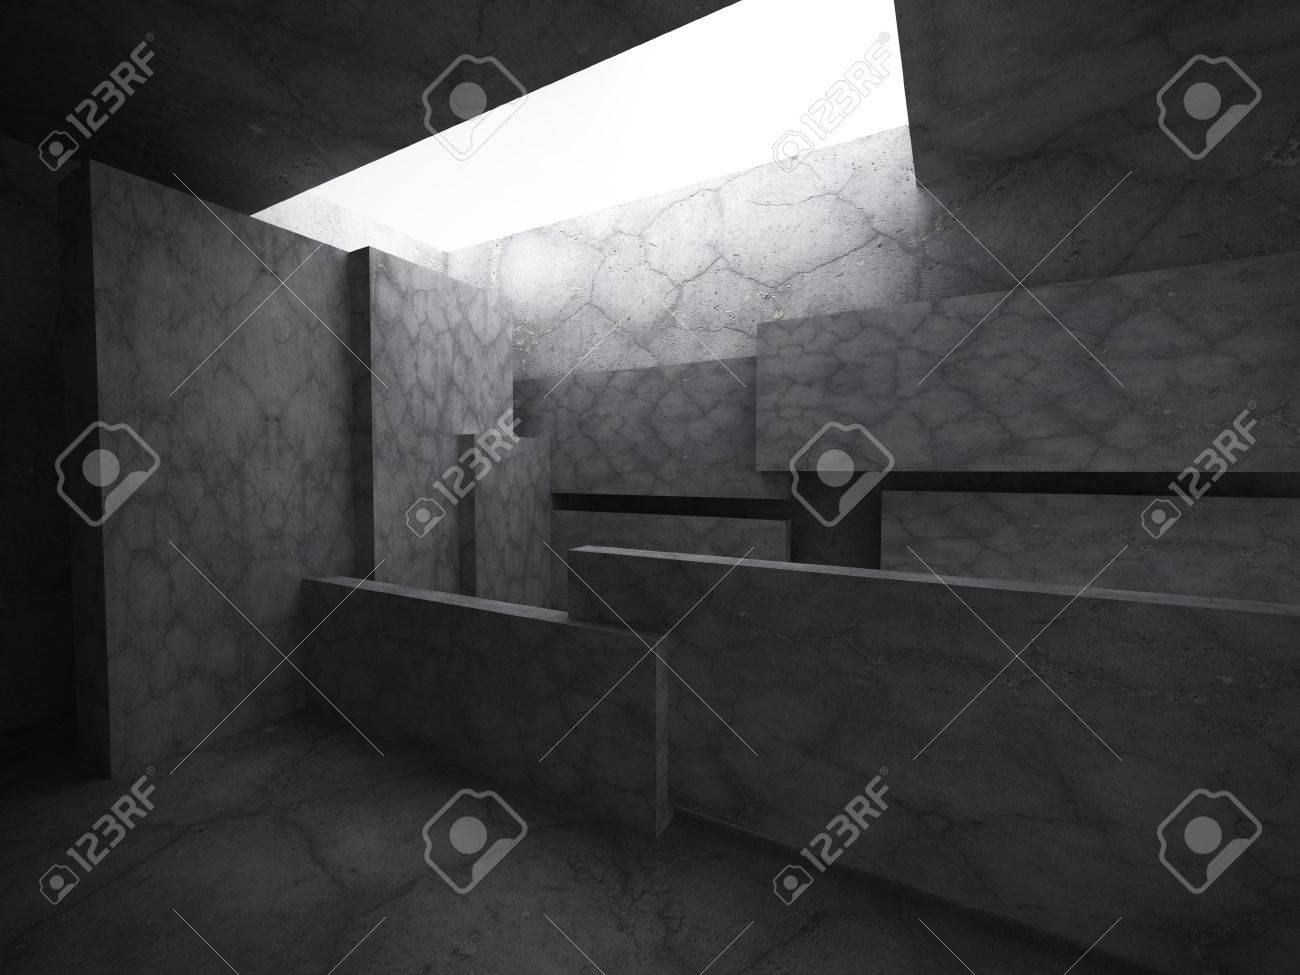 Interior De Cuarto Oscuro Concreto. Fondo De Arquitectura ...